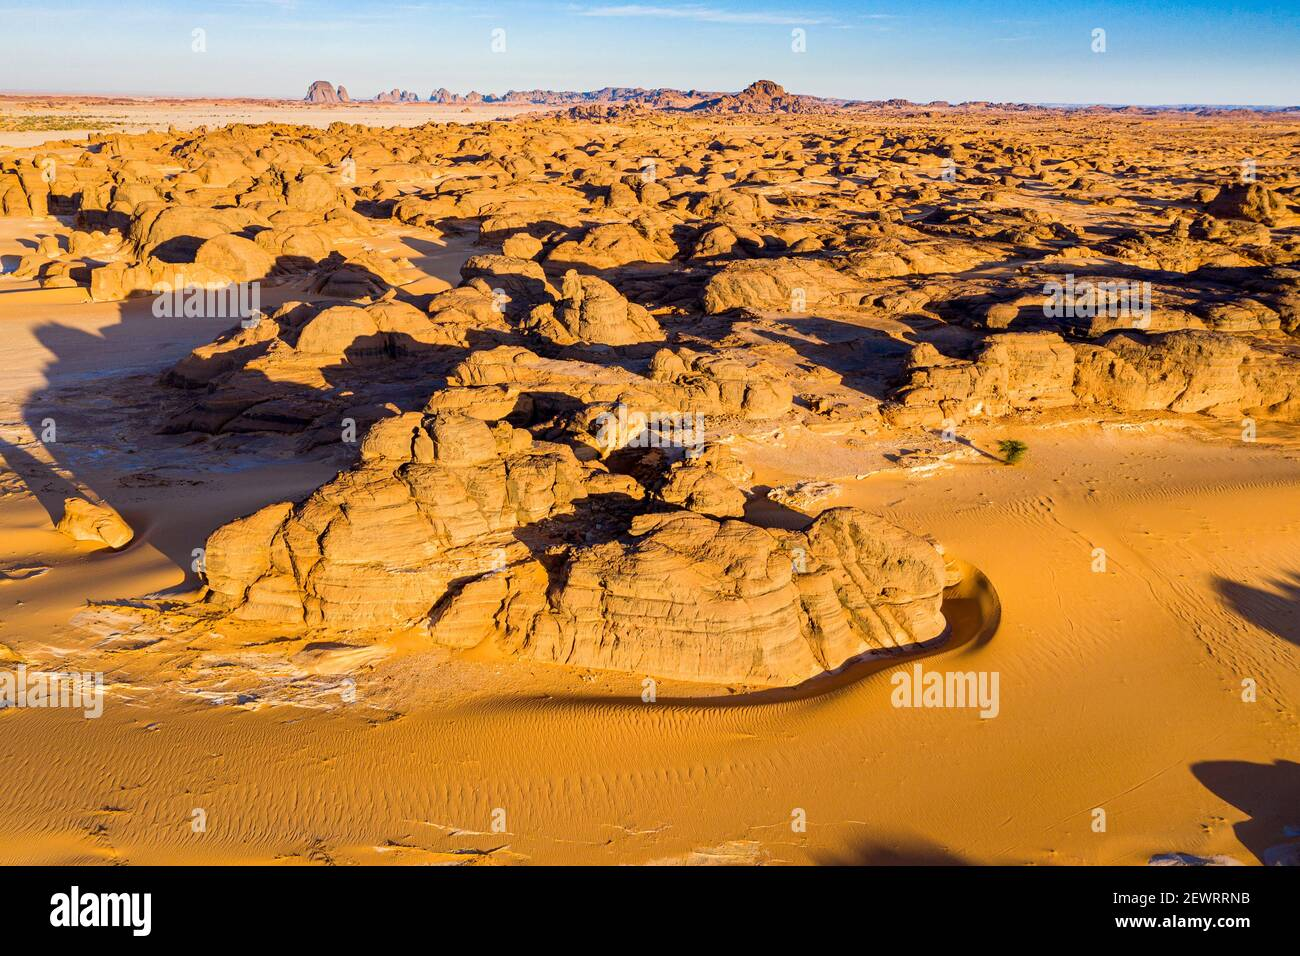 Aerial of beautiful rock formations in the Djado plateau, Tenere Desert, Sahara, Niger, Africa Stock Photo